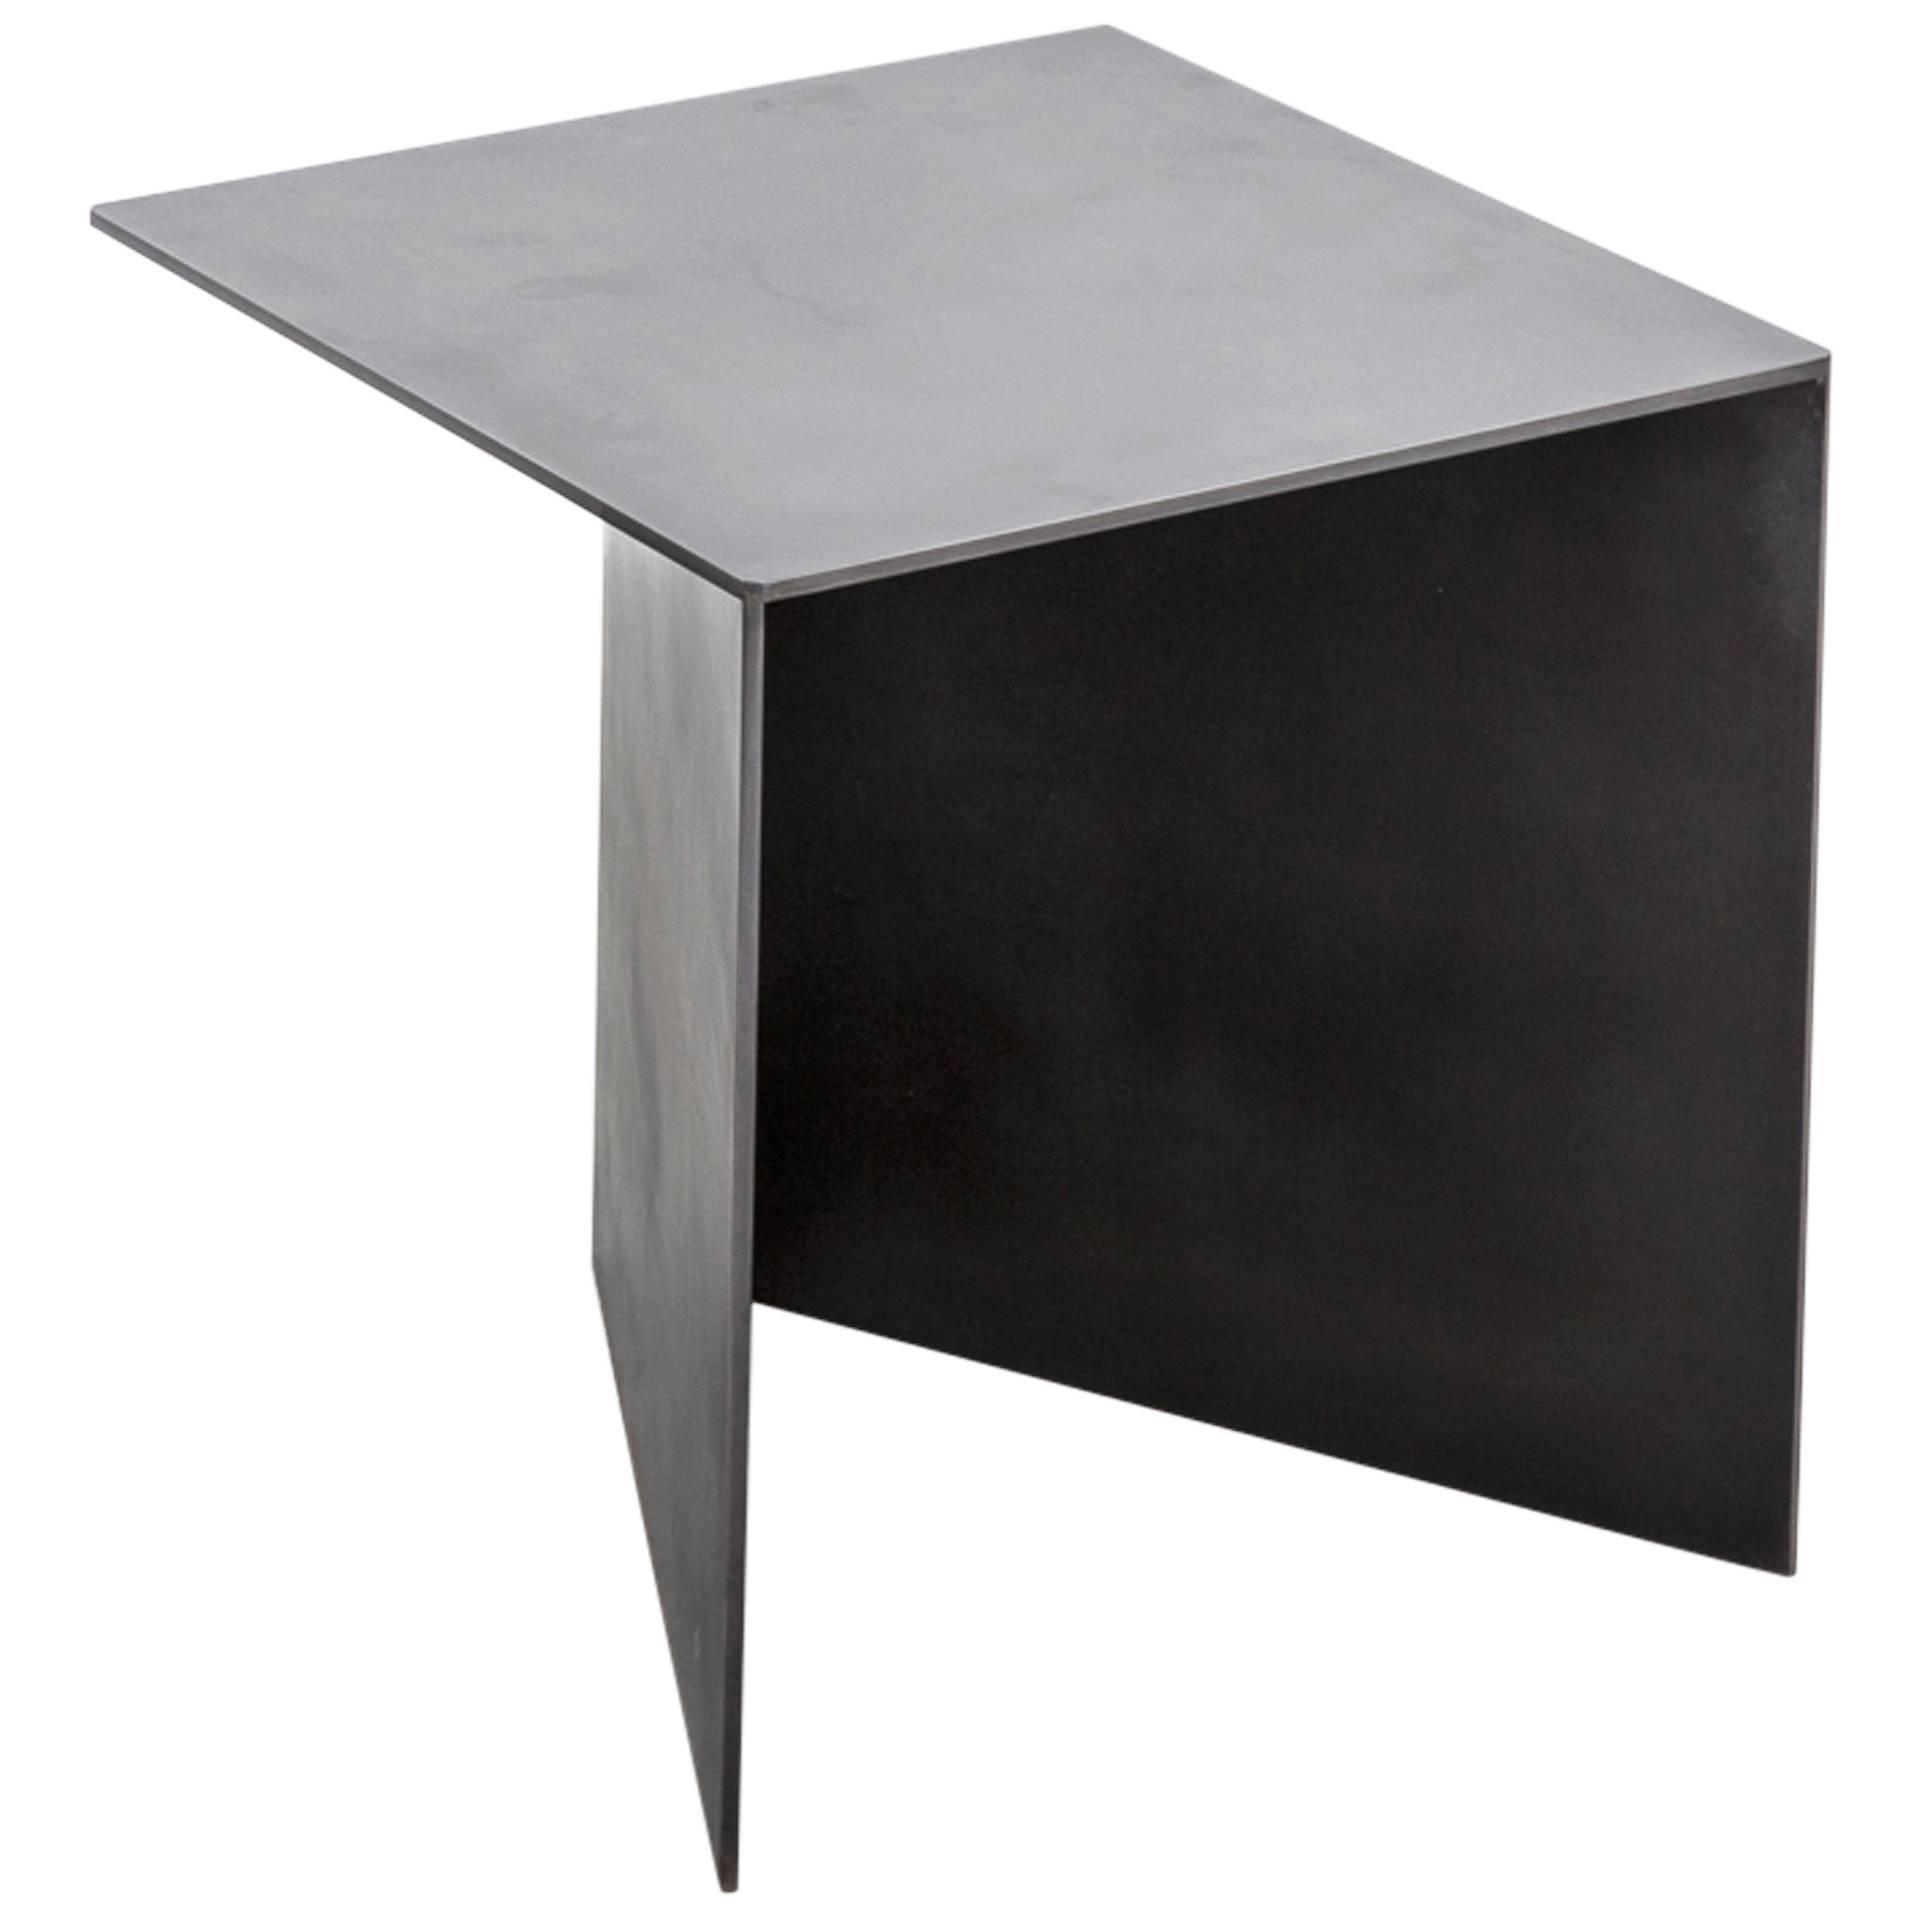 Tack end table c by uhuru design in black steel for sale at 1stdibs